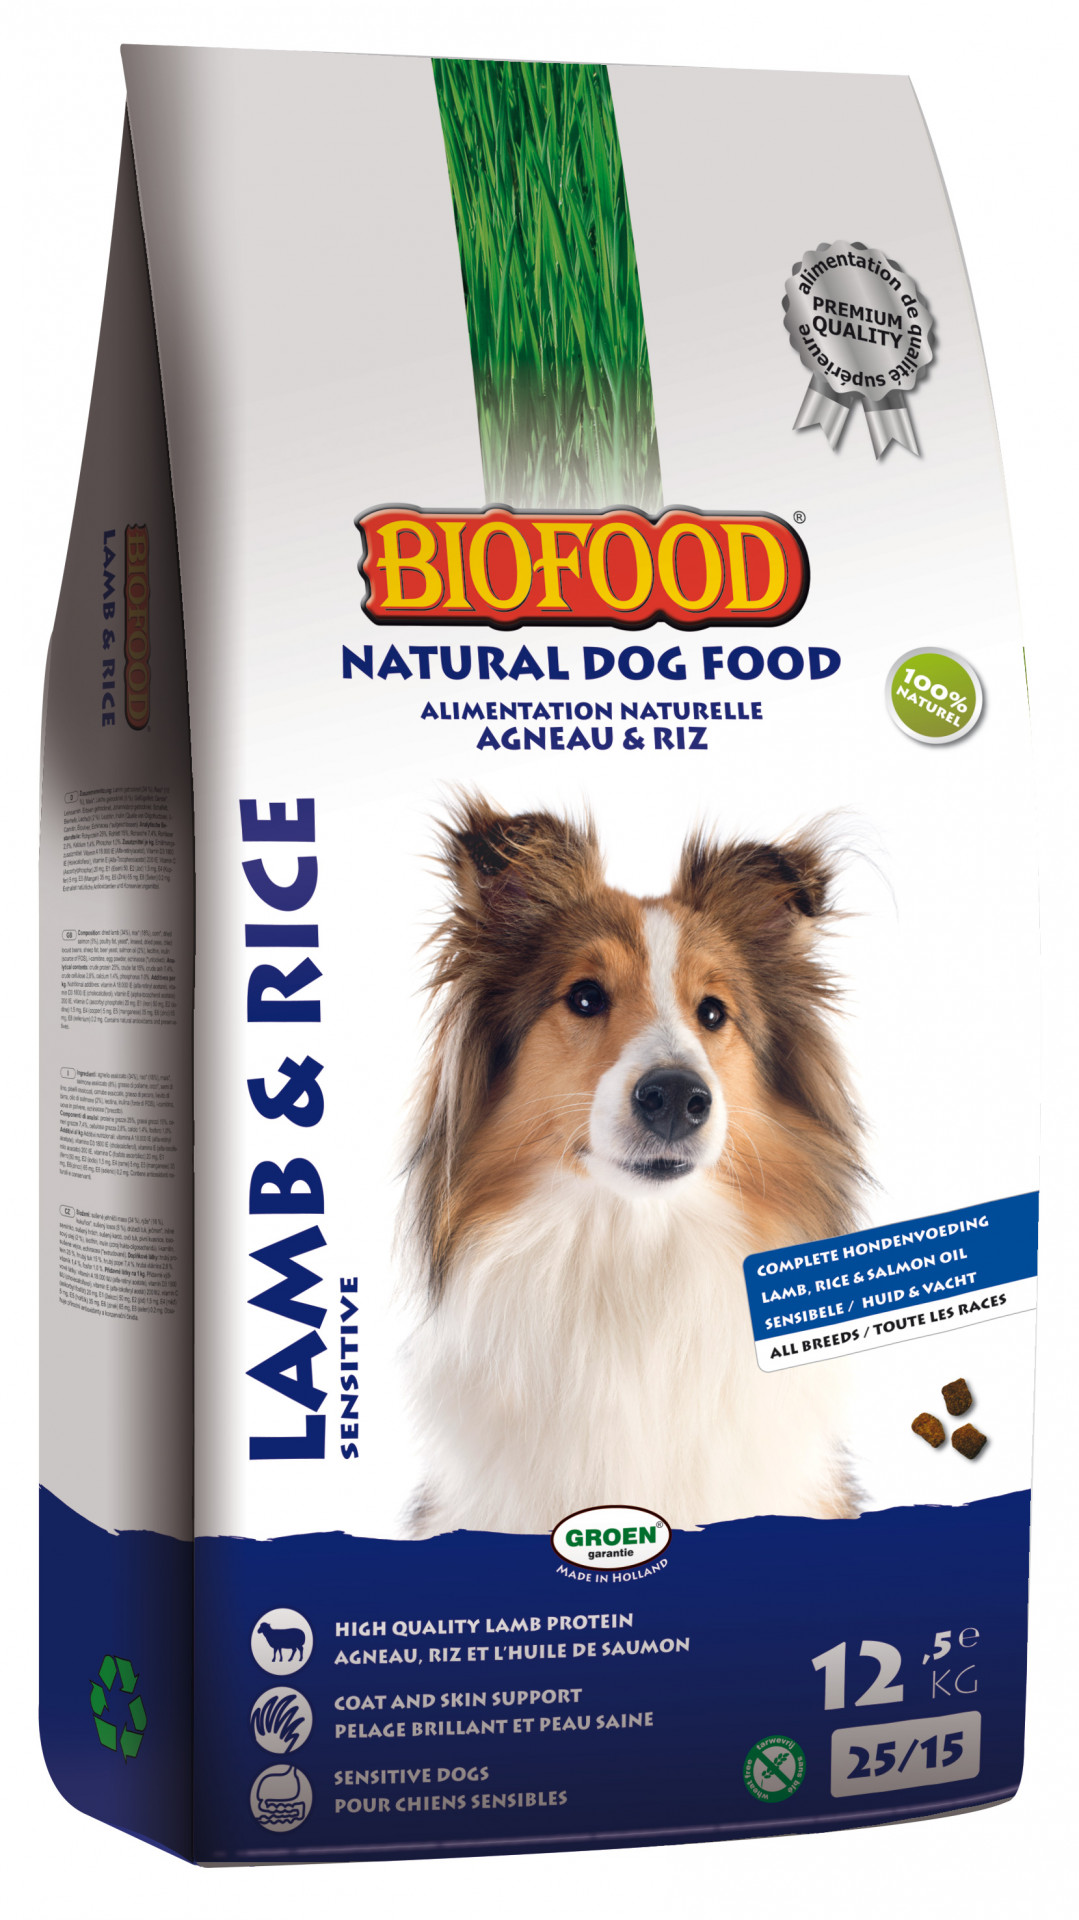 Biofood hondenvoer Lam & Rijst 12,5 kg